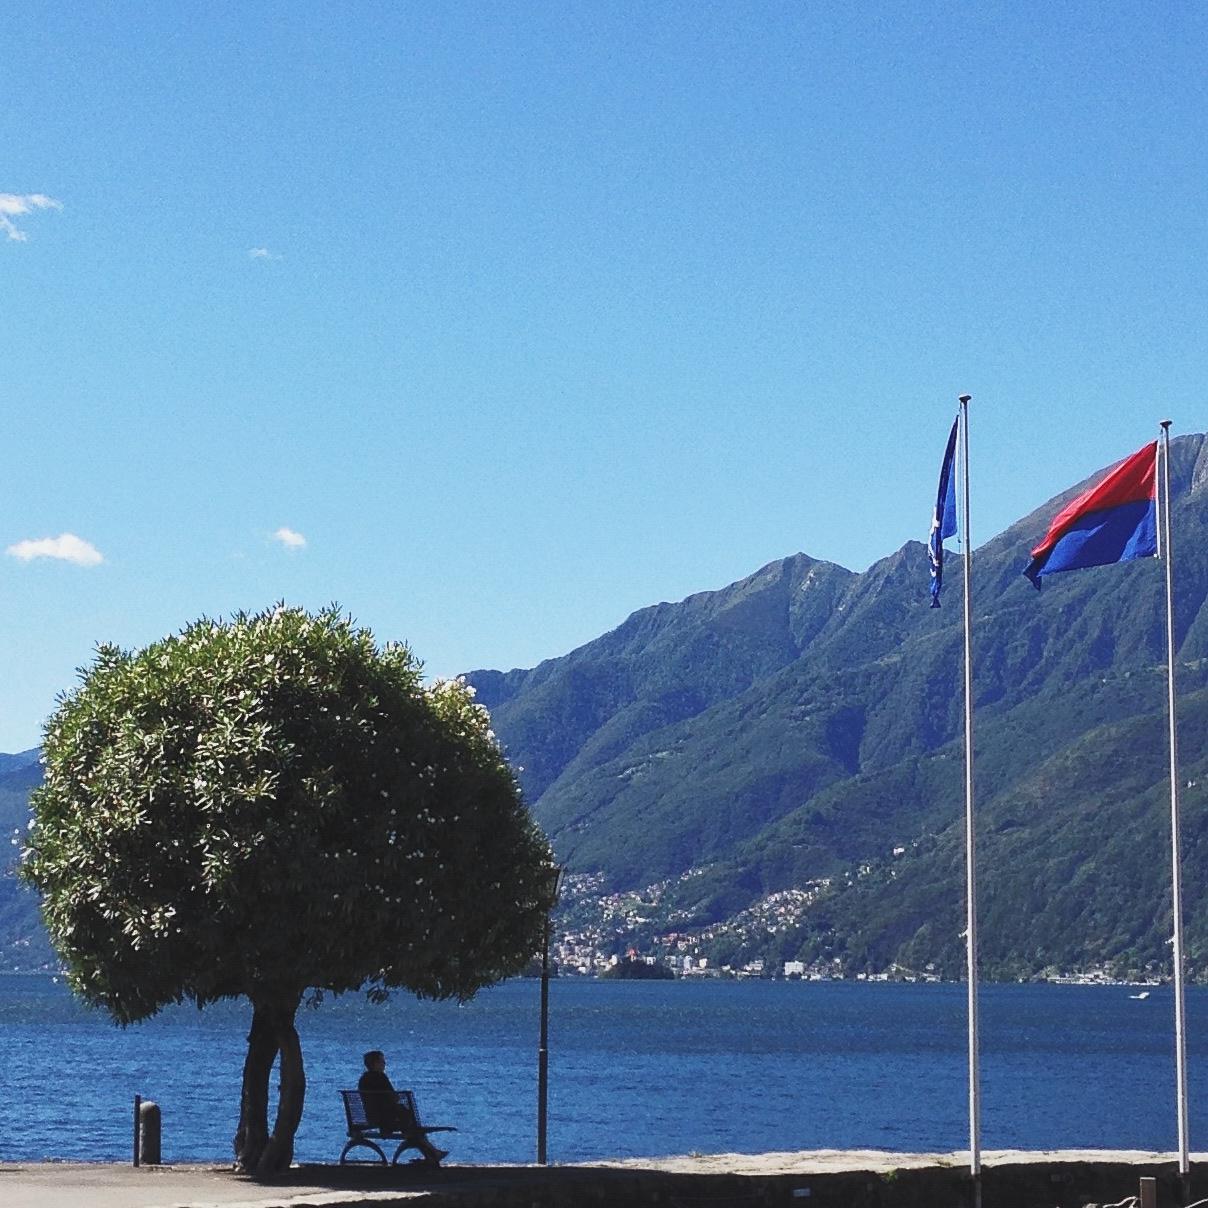 Ascona, Switzerland (2014)